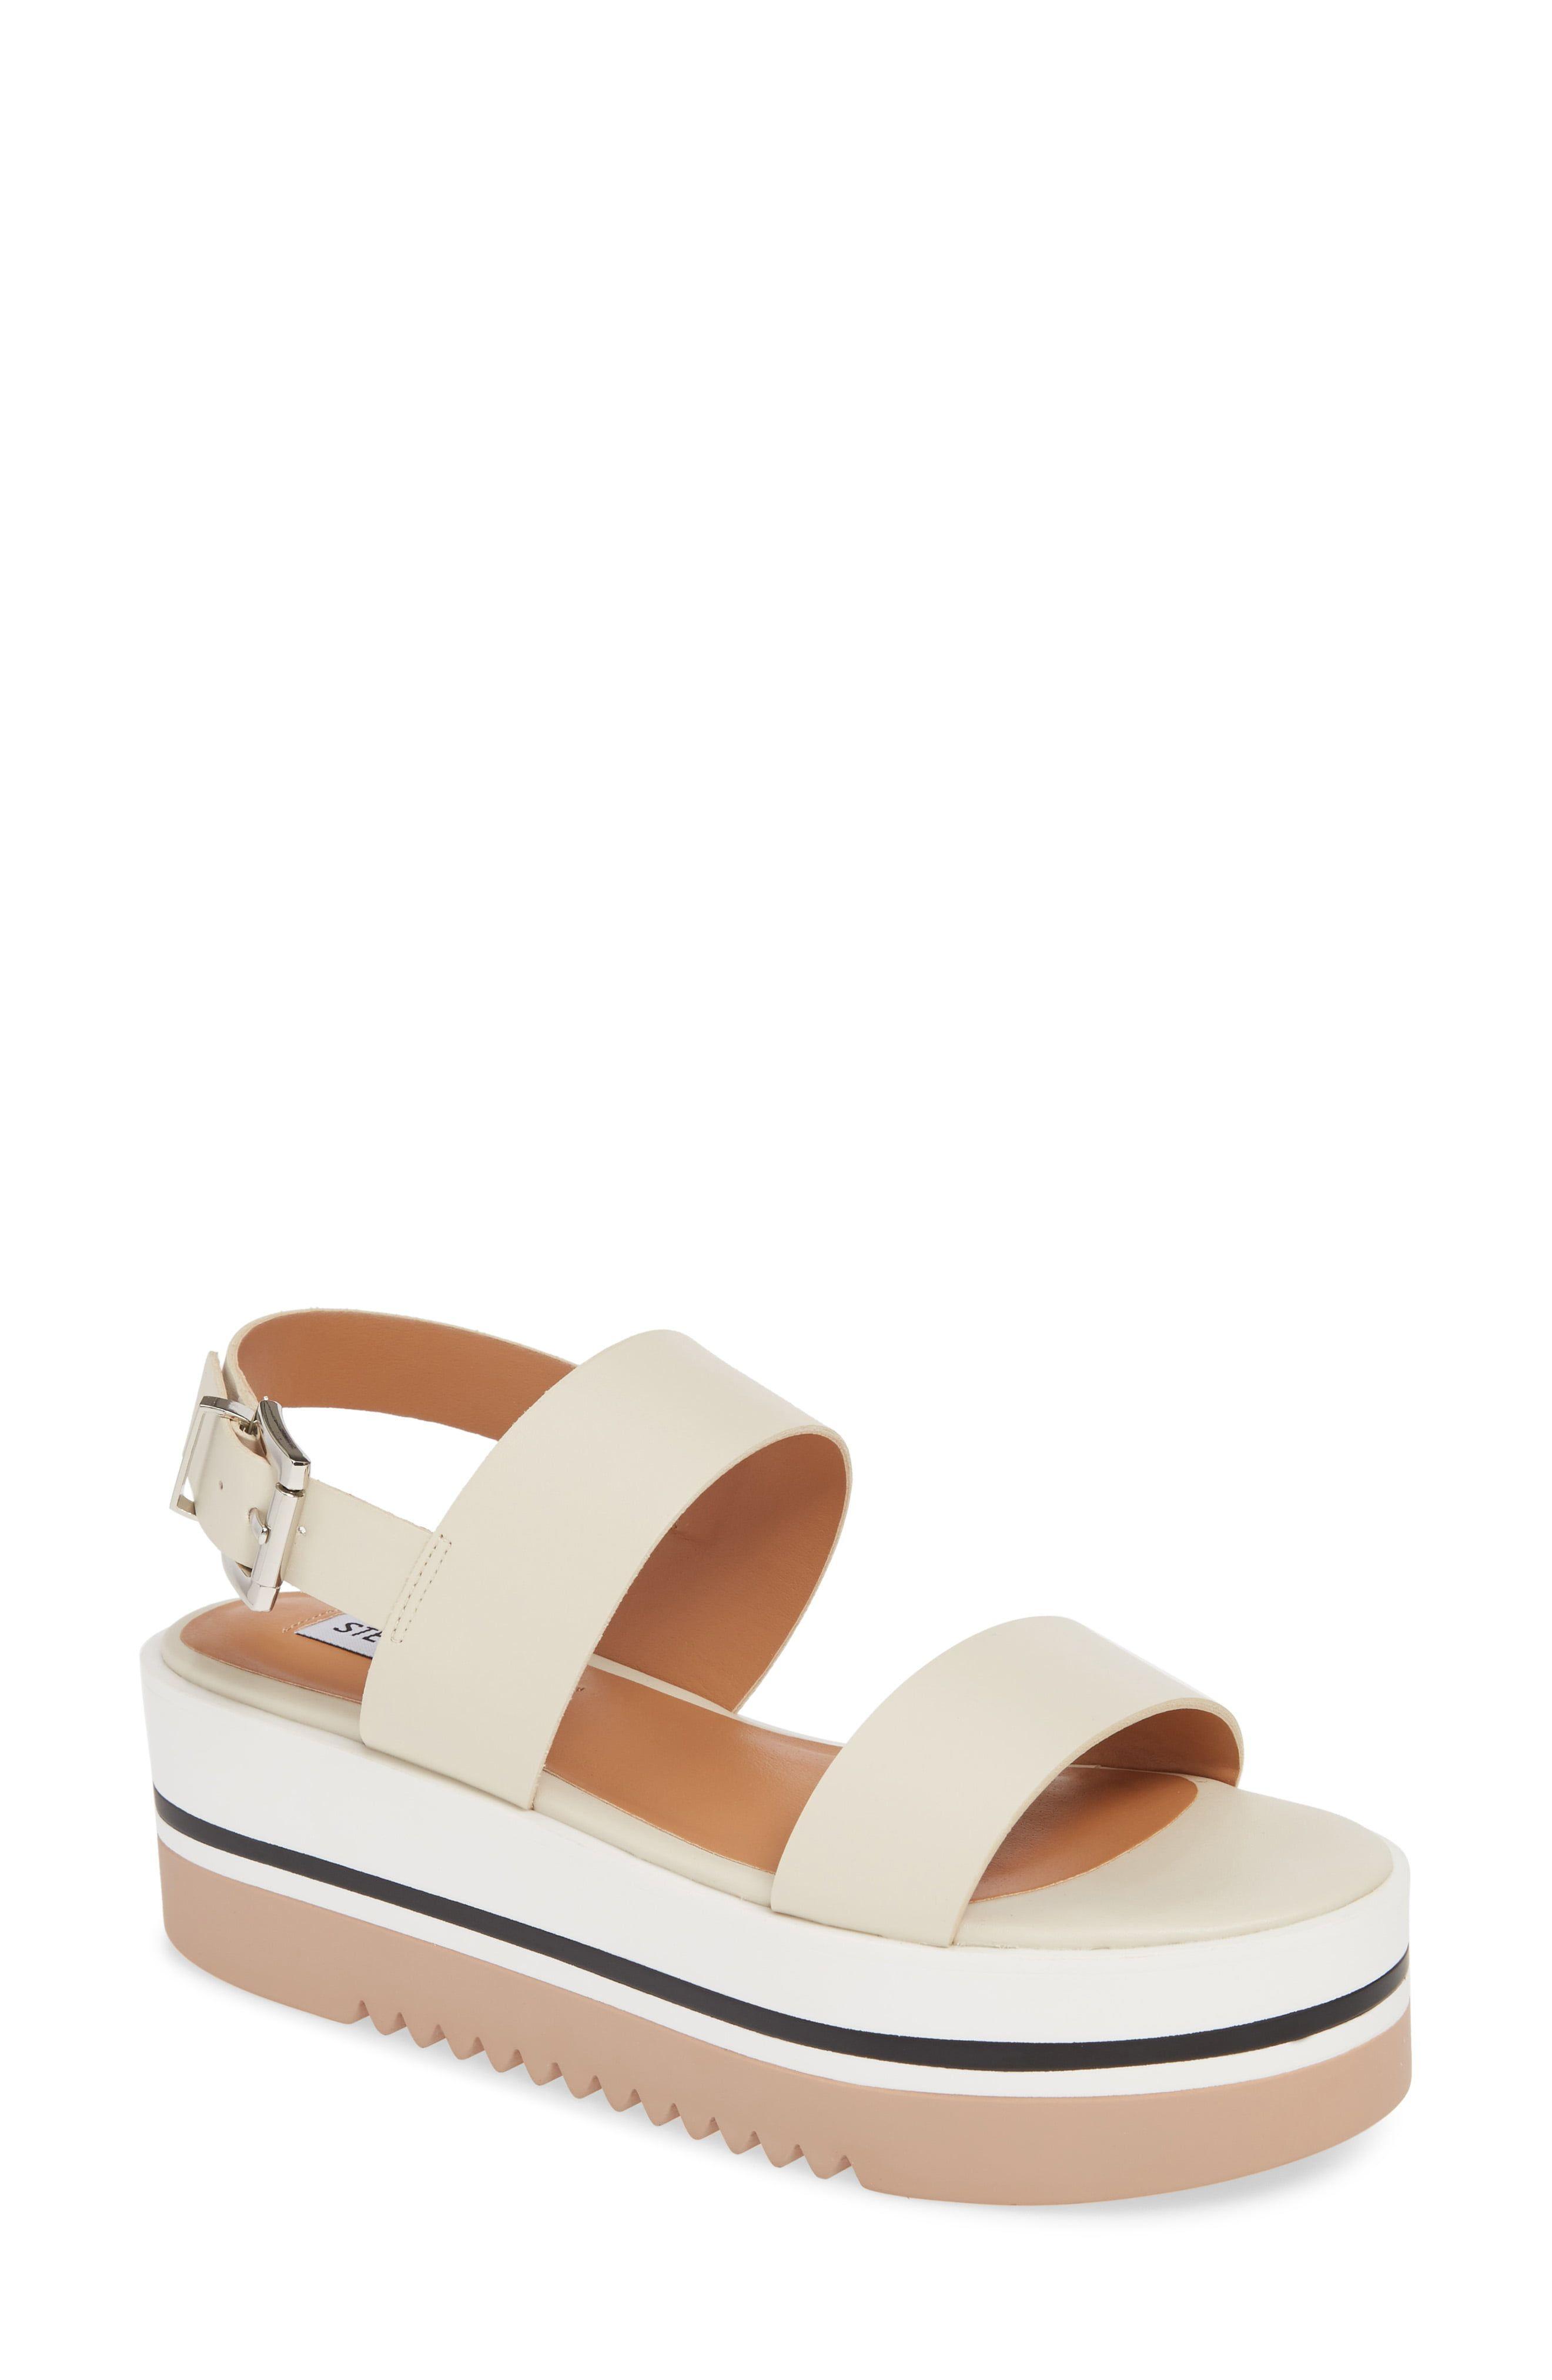 cb68c422e4a Women's Steve Madden Adora Platform Sandal, Size 6.5 M - Ivory in ...